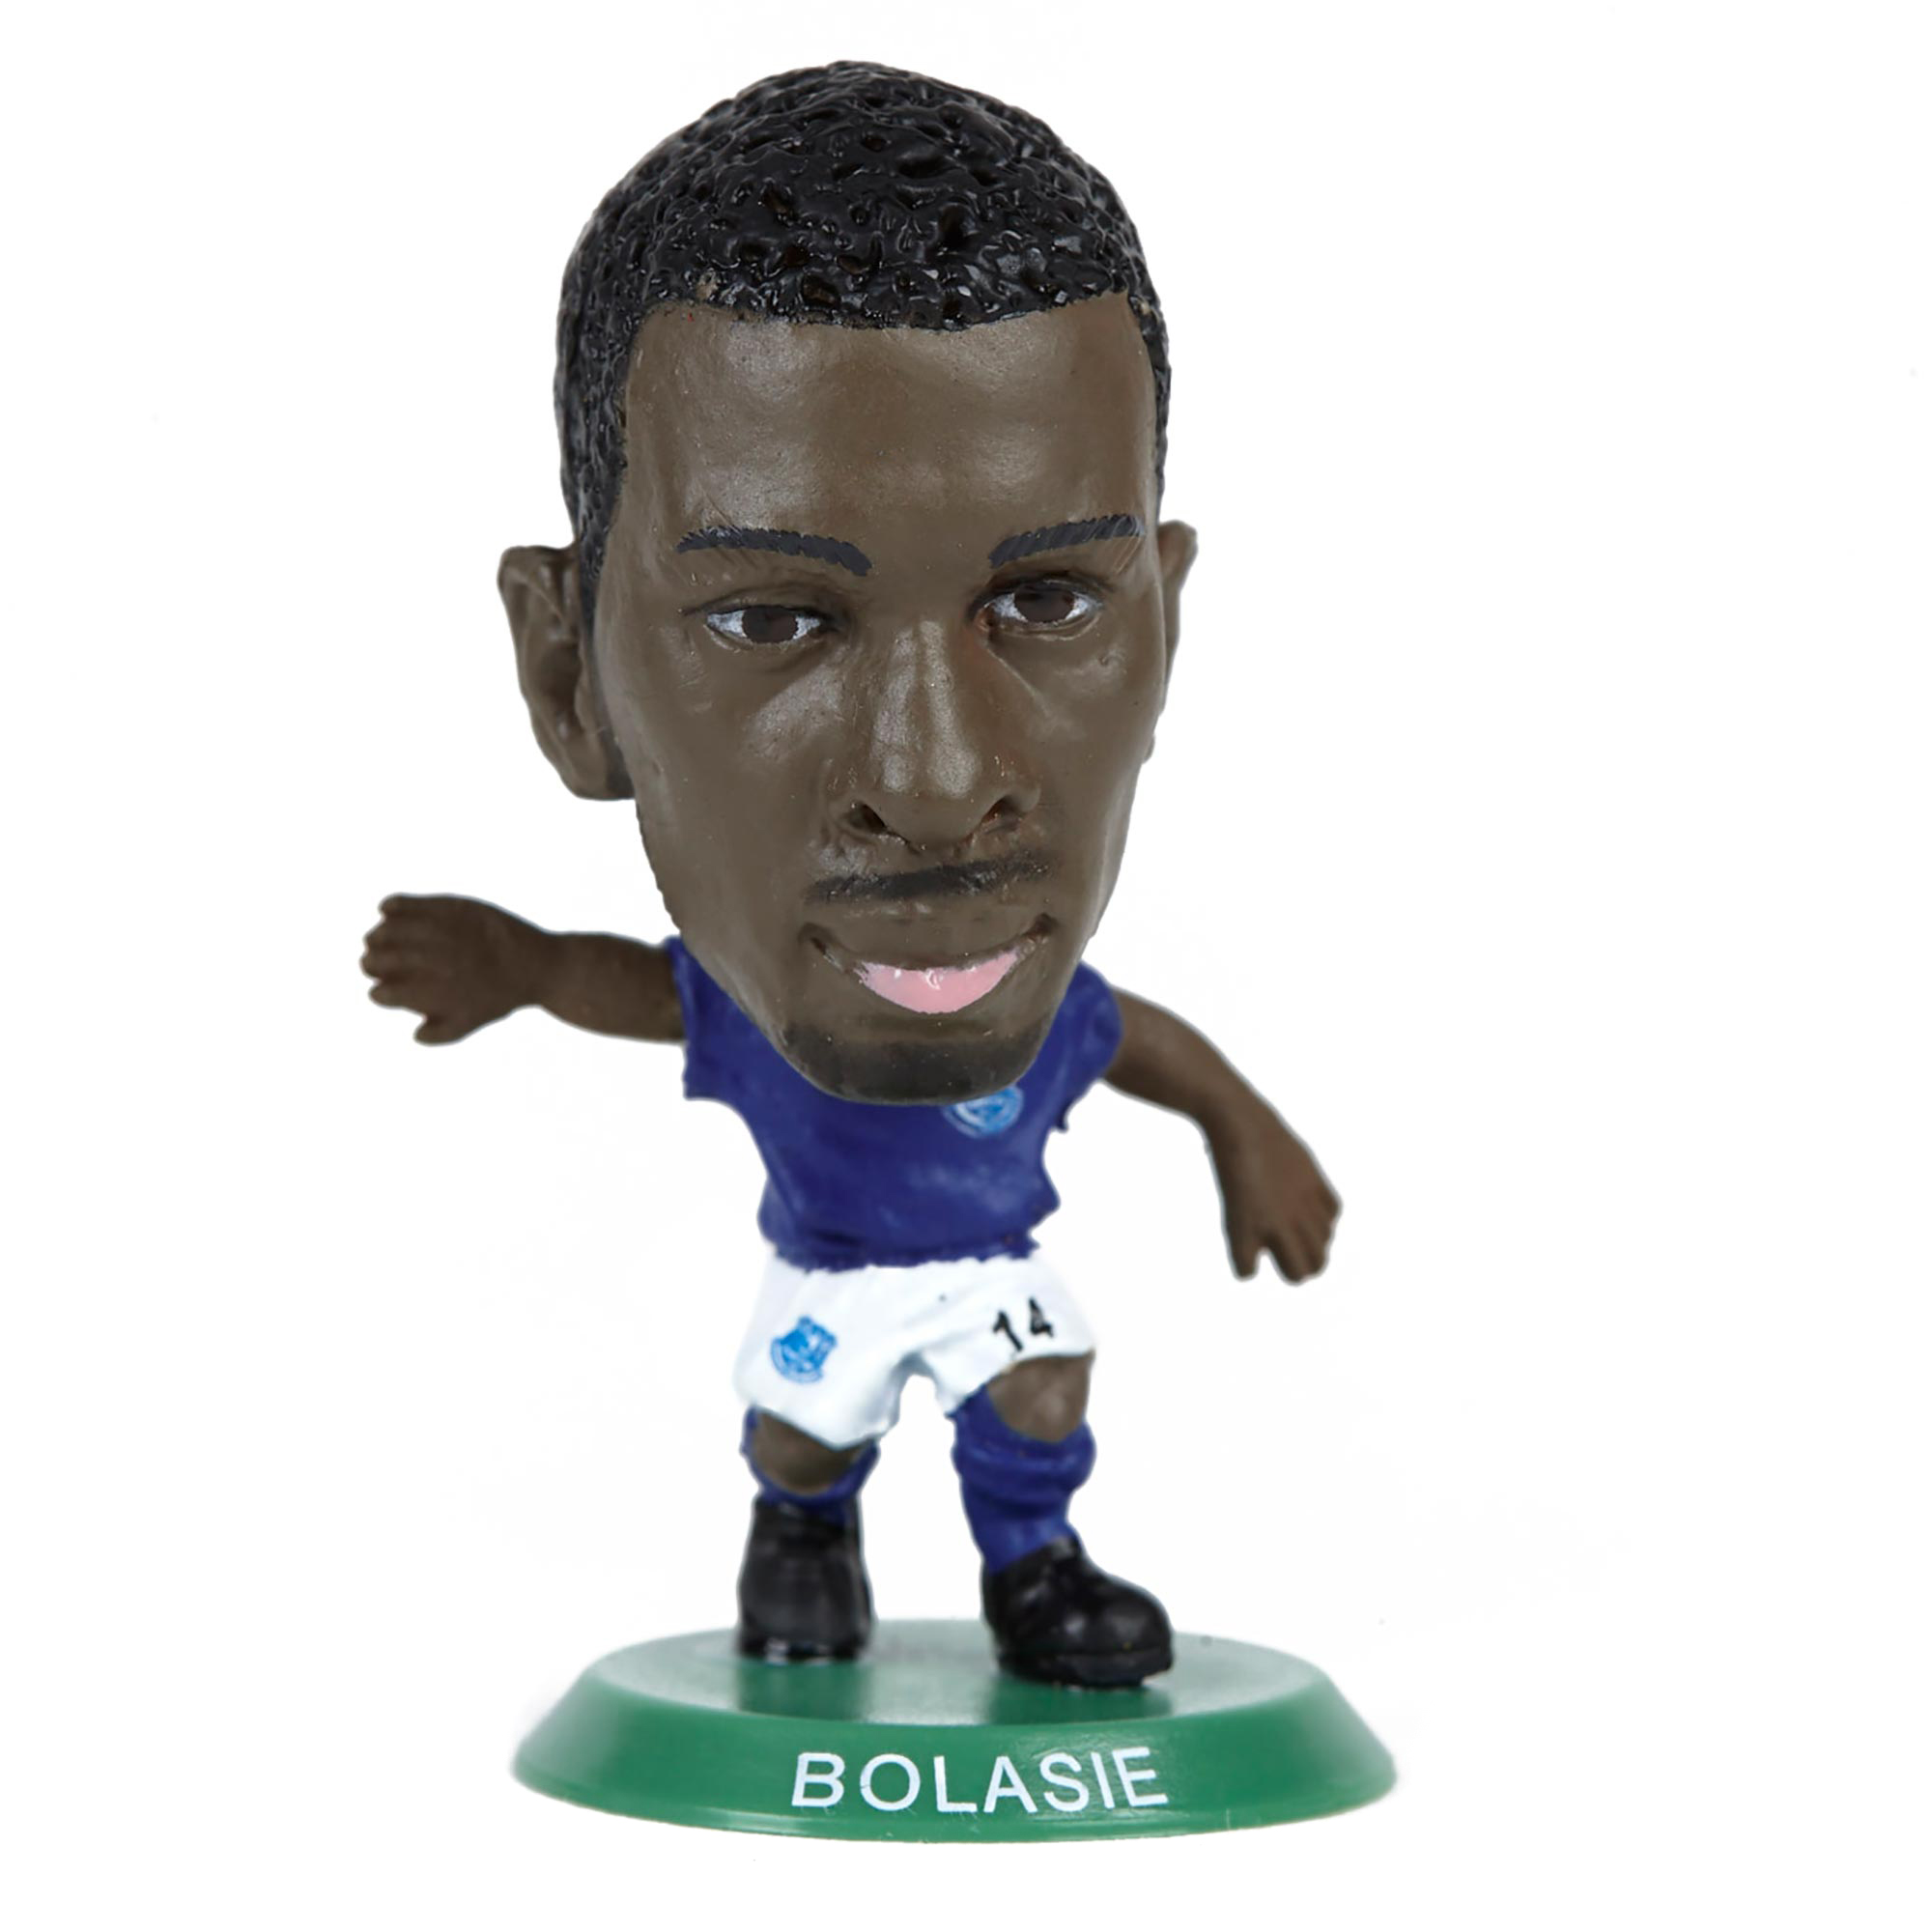 Everton Bolasie SoccerStarz